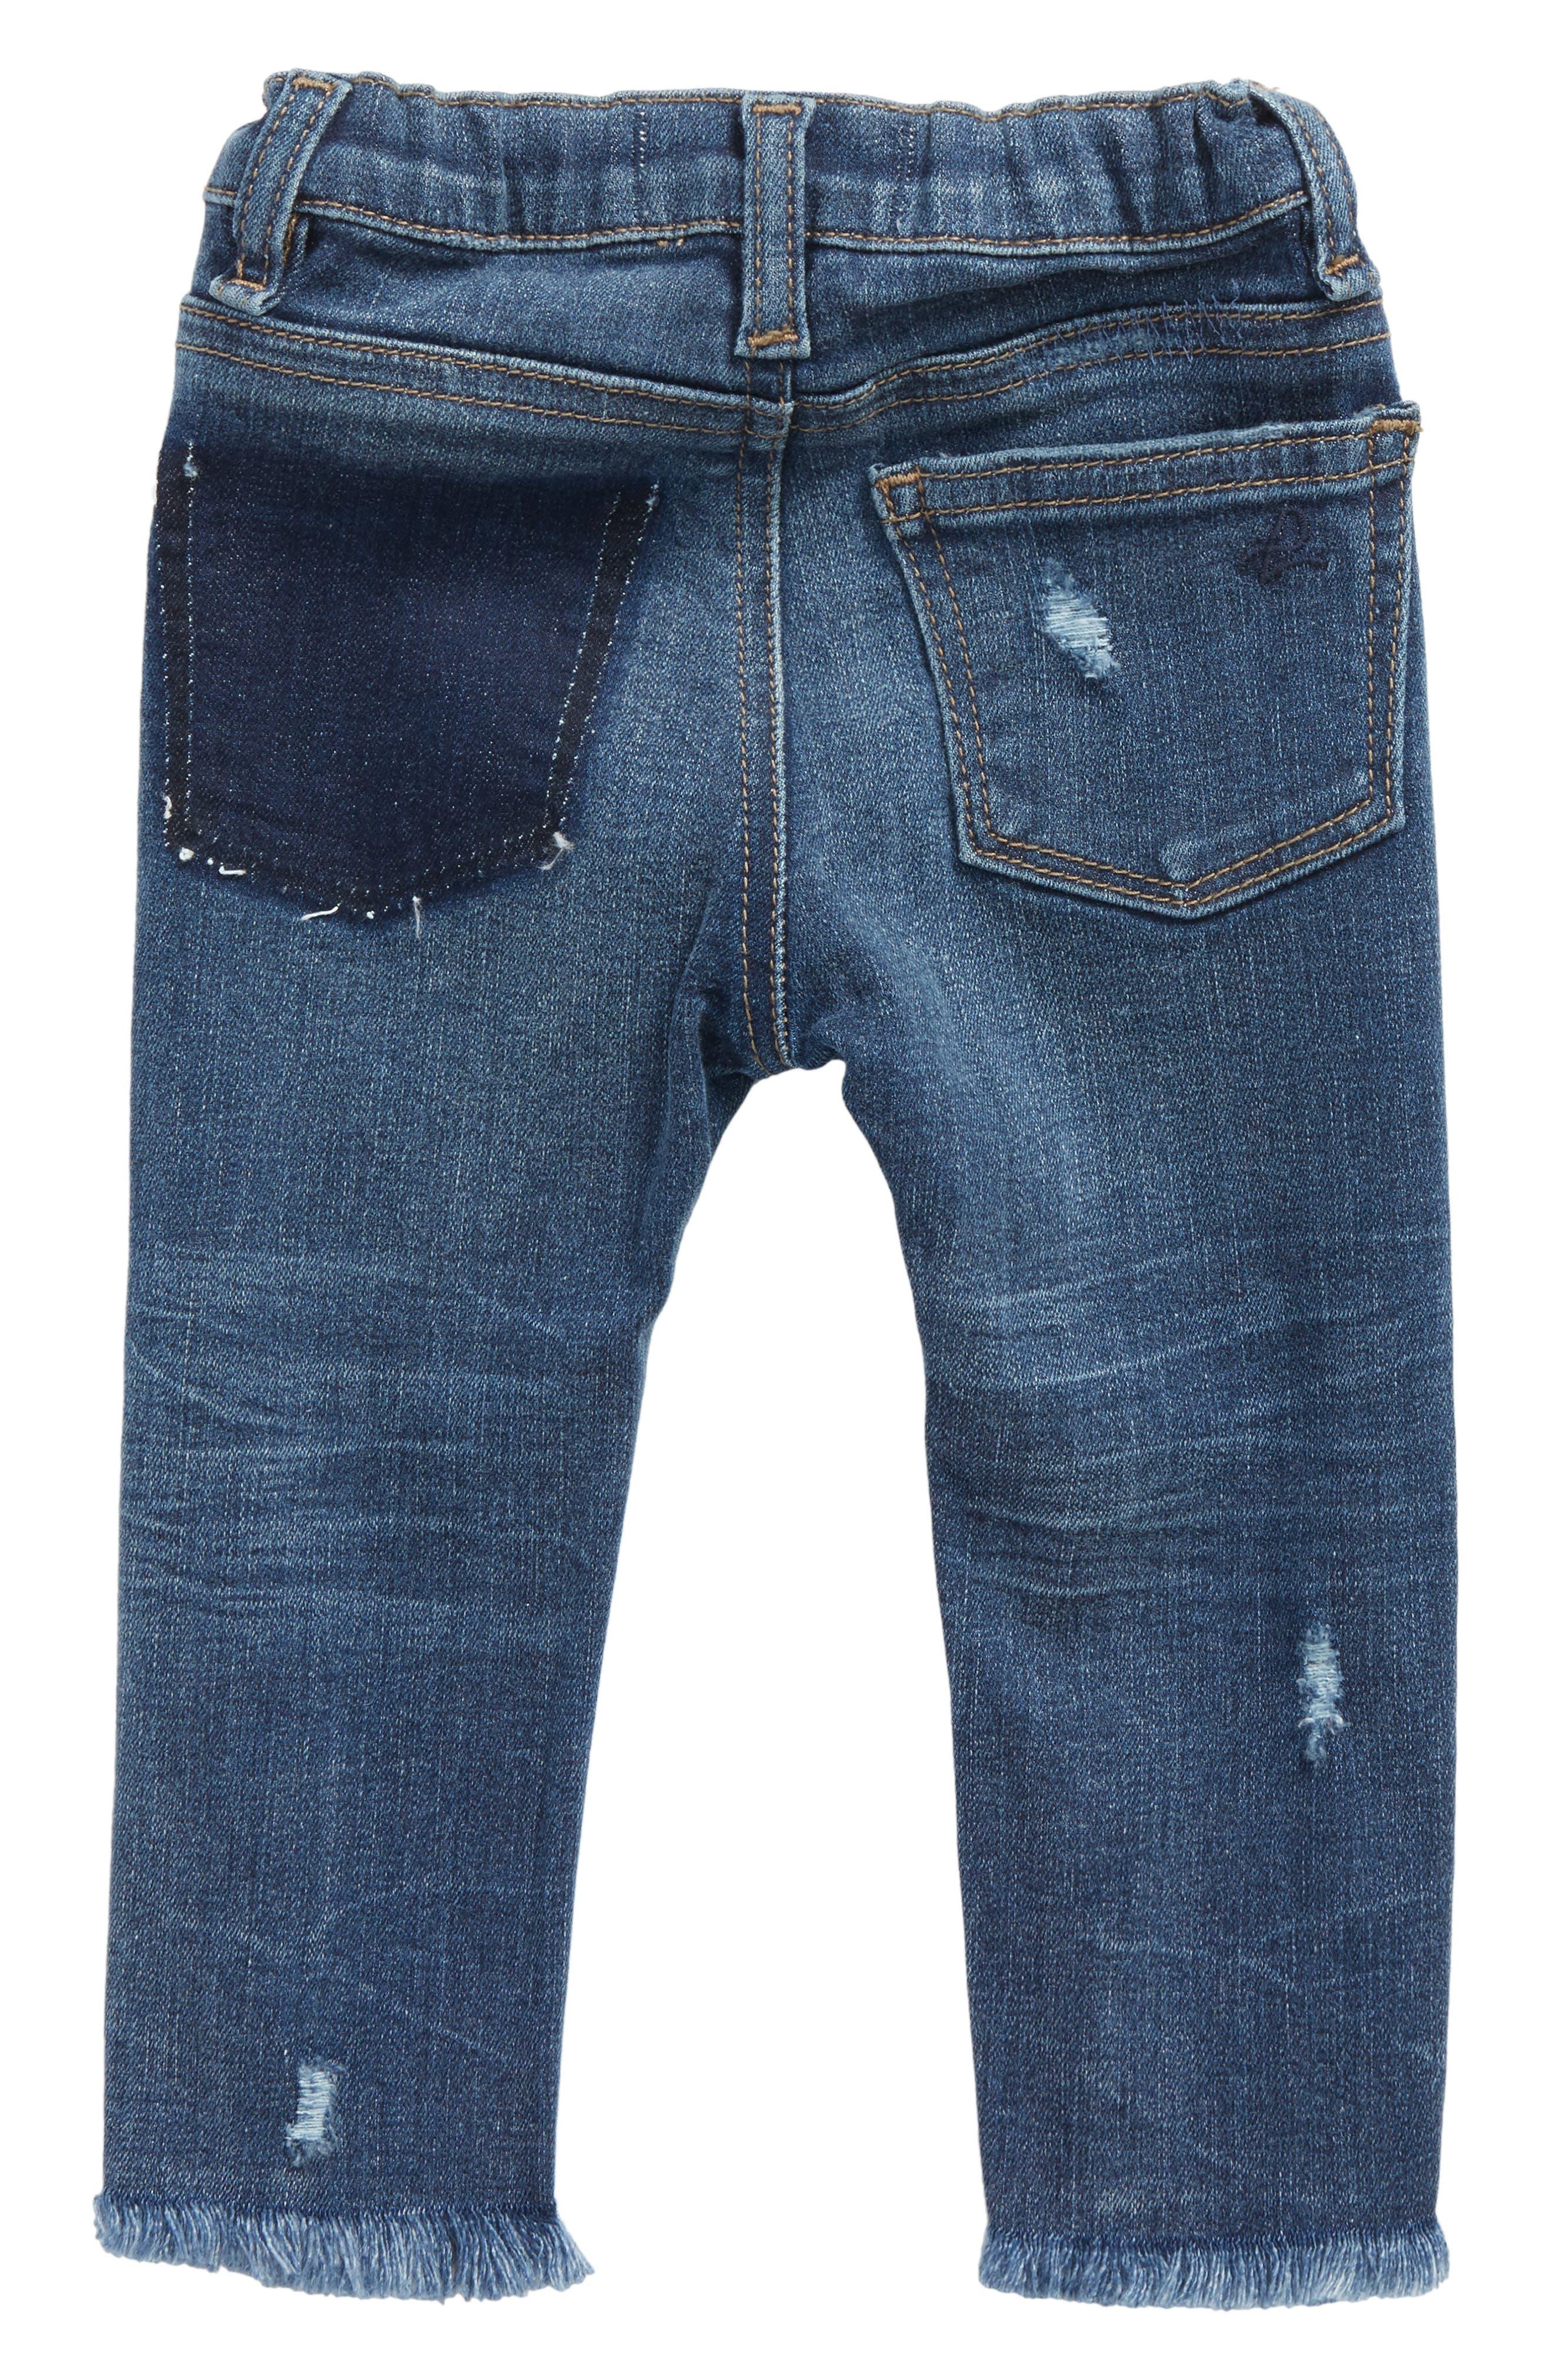 Distressed Skinny Jeans,                             Alternate thumbnail 2, color,                             Sumner